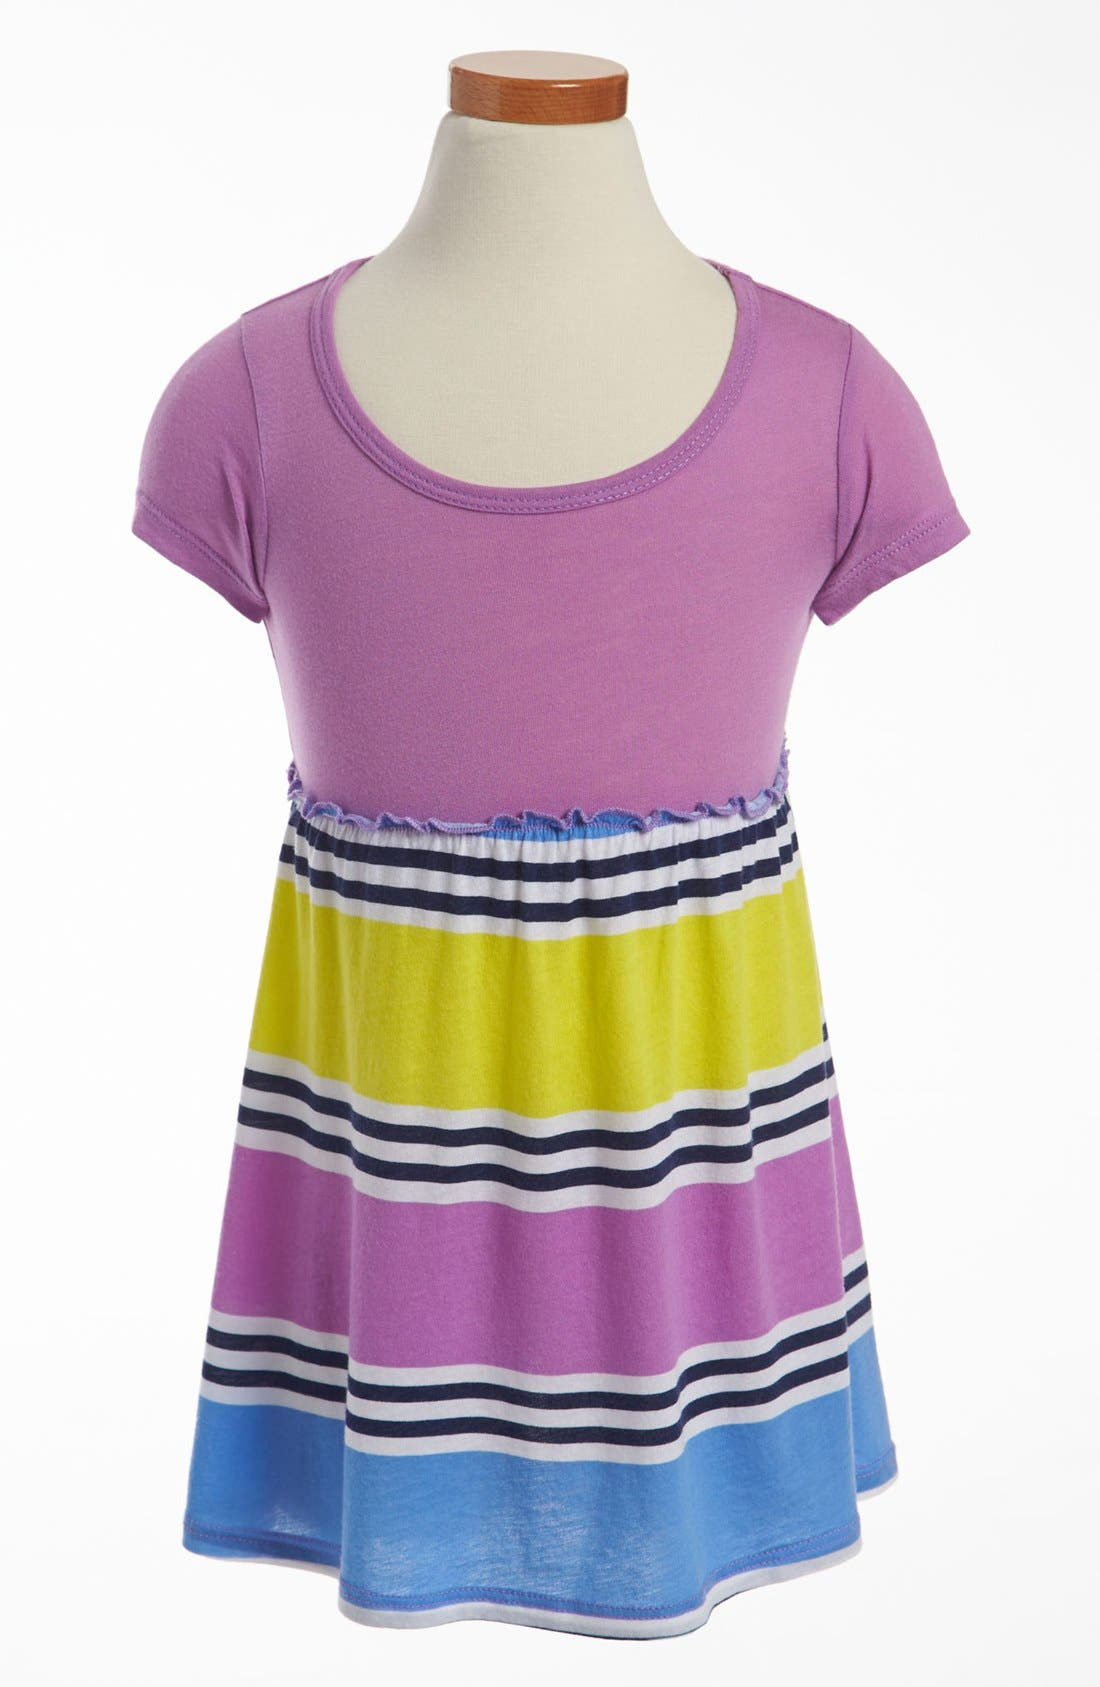 Main Image - Splendid 'Cabana Stripe' Dress (Toddler)